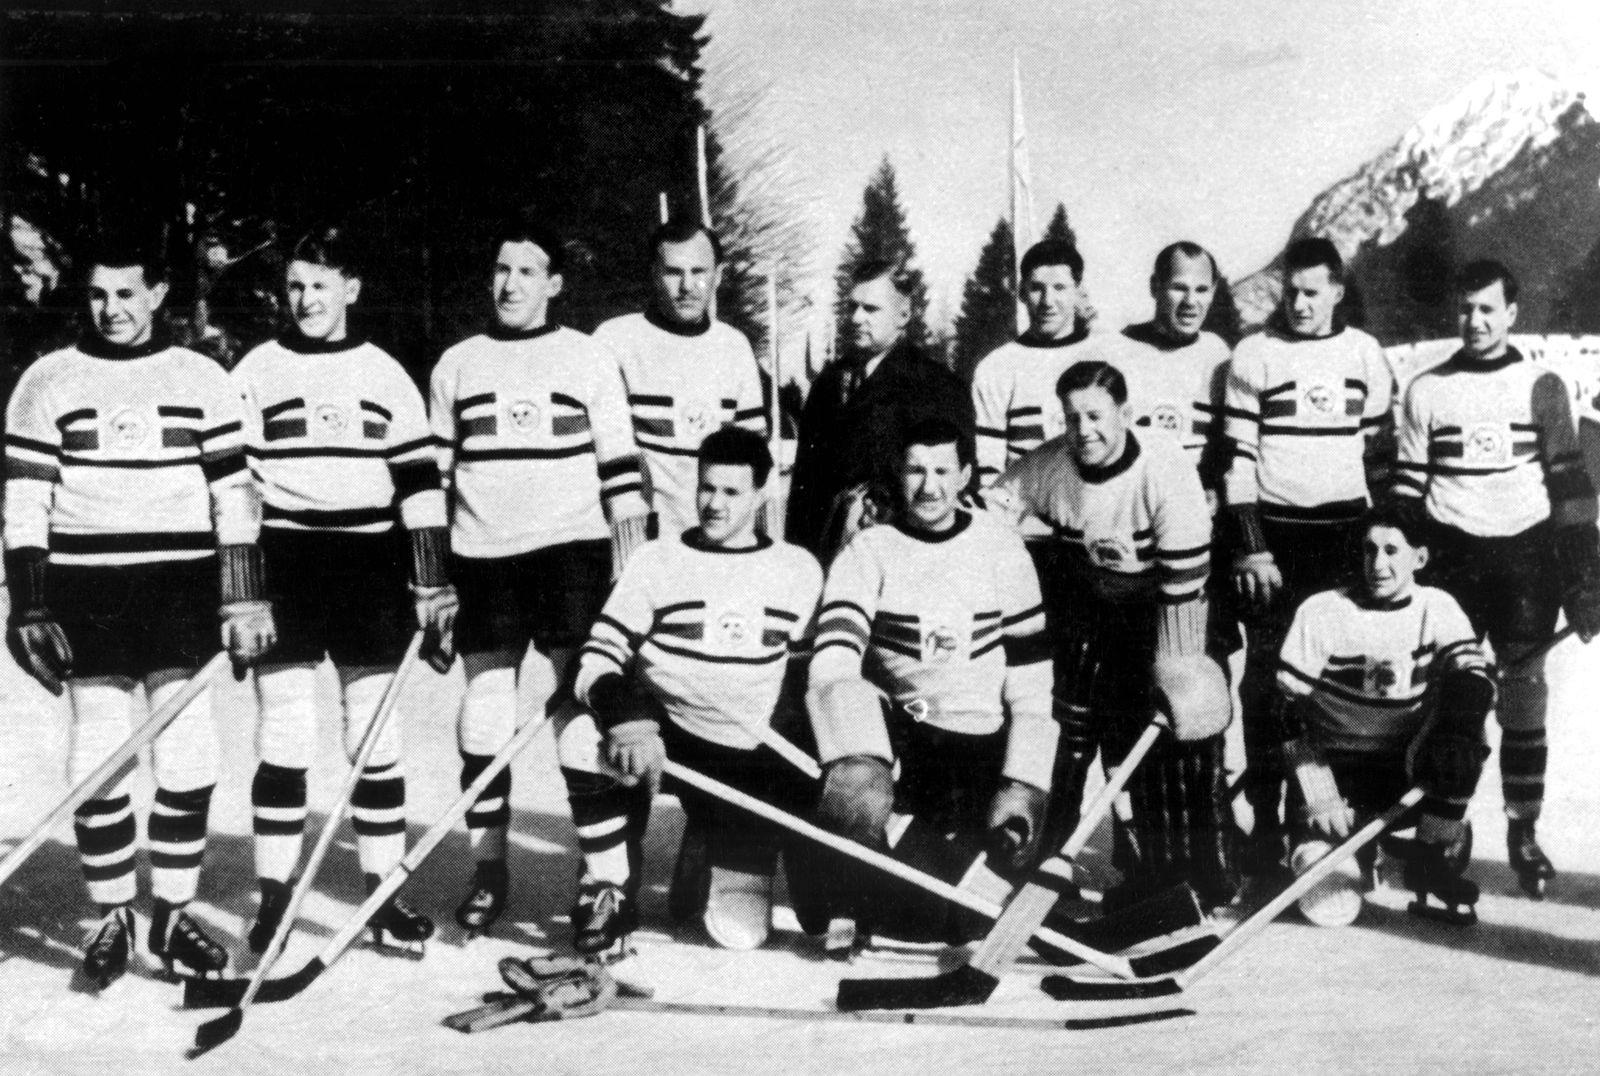 Winter Olympics 1936 - Garmisch and Partenkirchen in Bavaria, Germany. Great Britain ice hockey team who beat Canada to